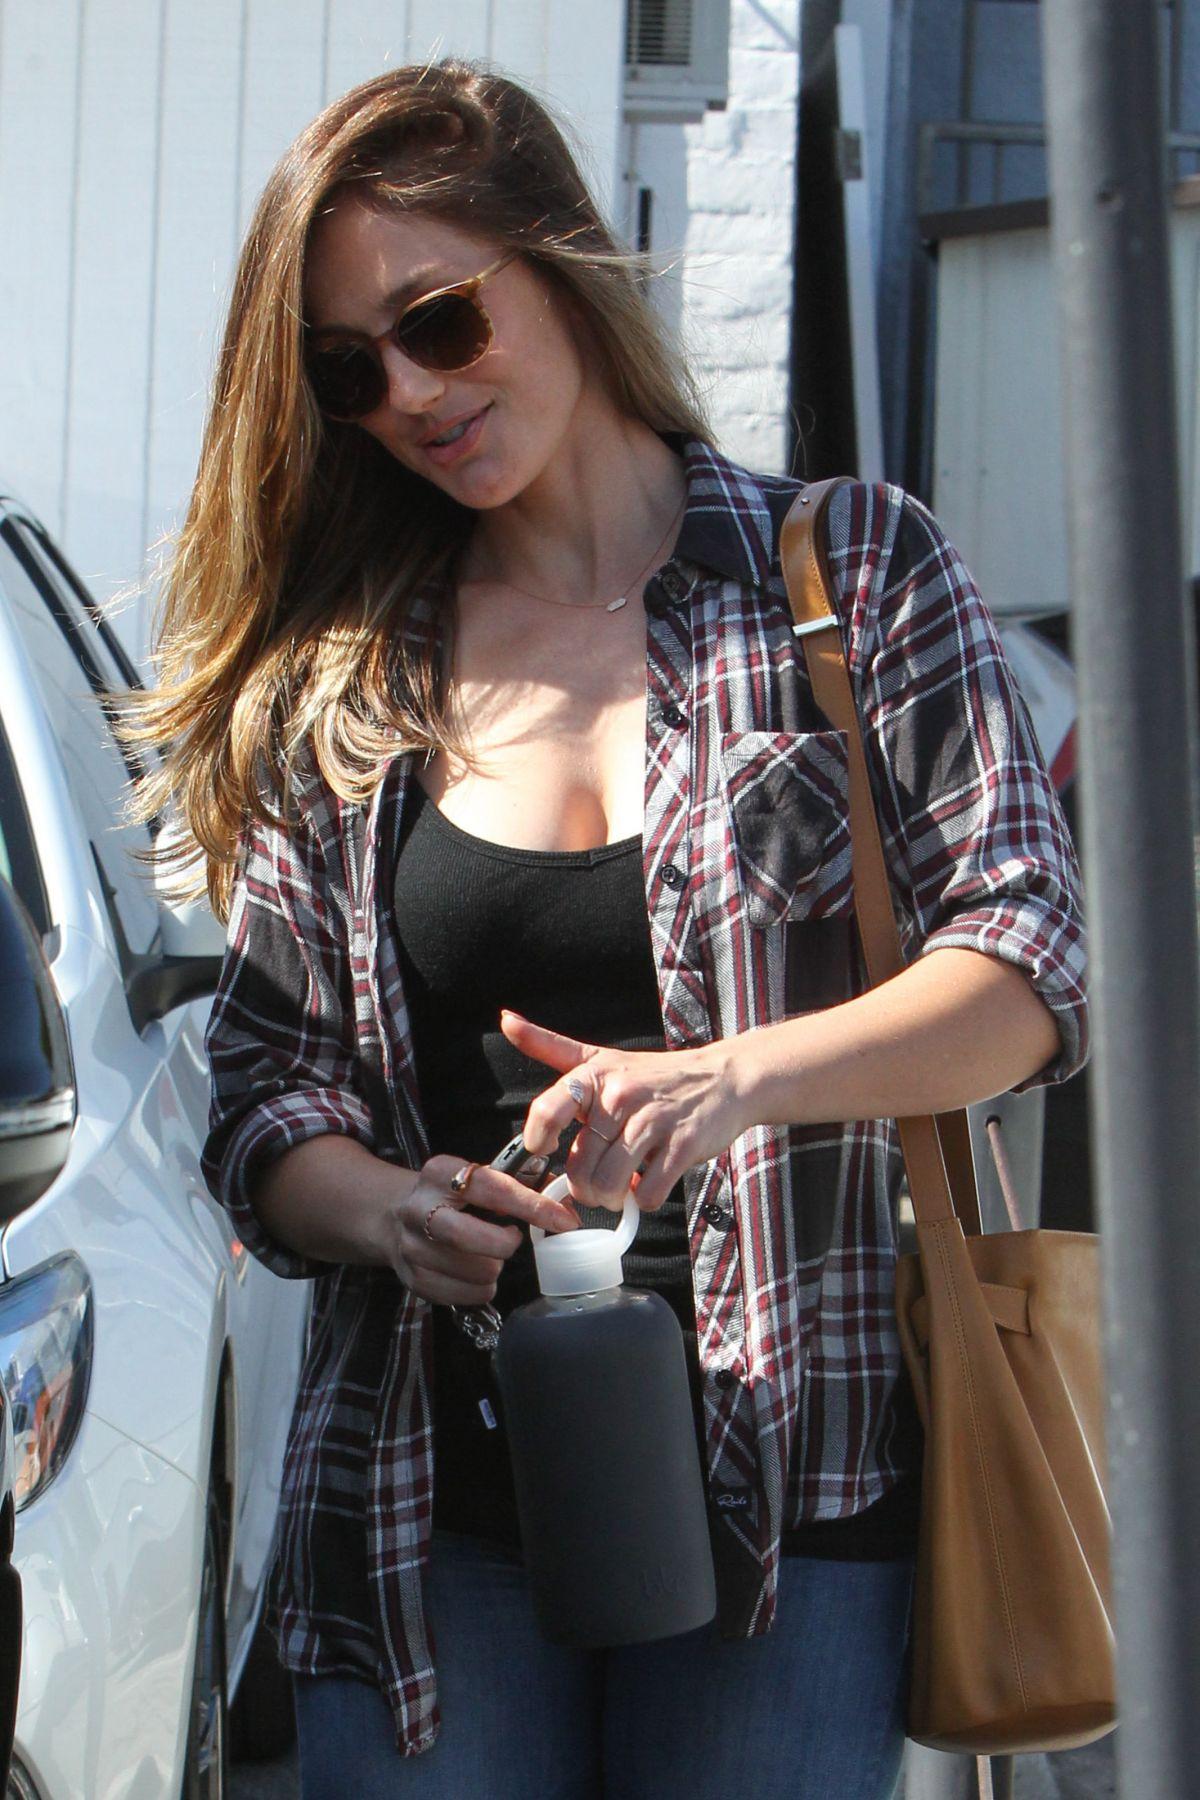 MINKA KELLY Leaves Meche Salon in Beverly Hills 04/27/2016